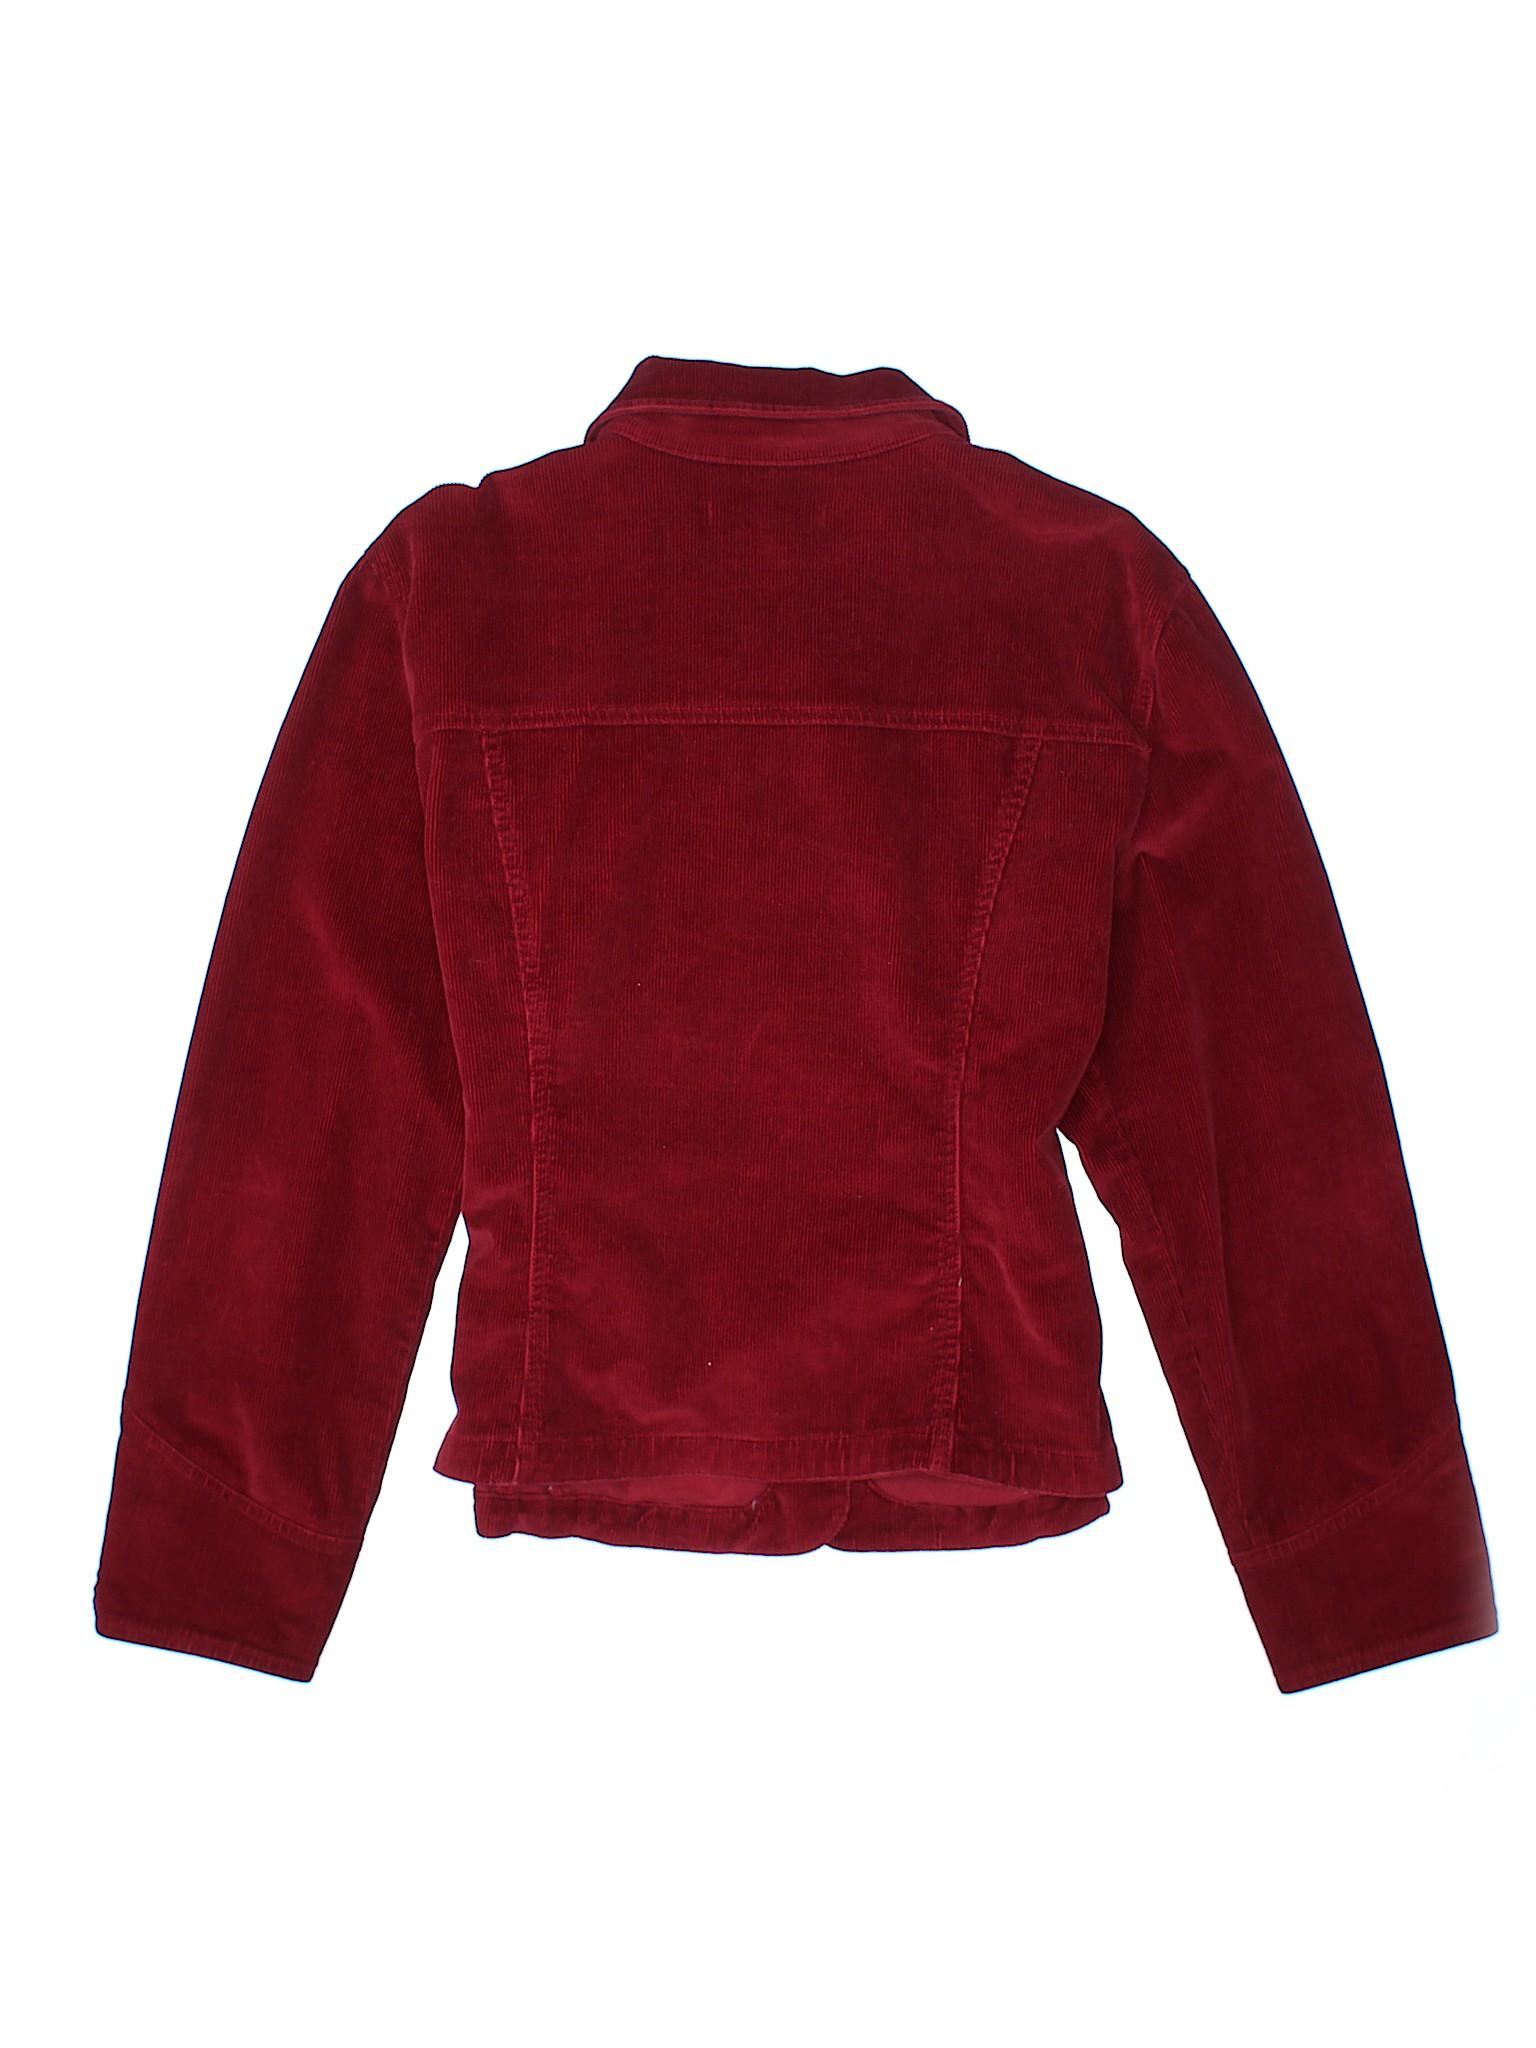 leisure A Boutique Jacket M I 8nzxq76Z